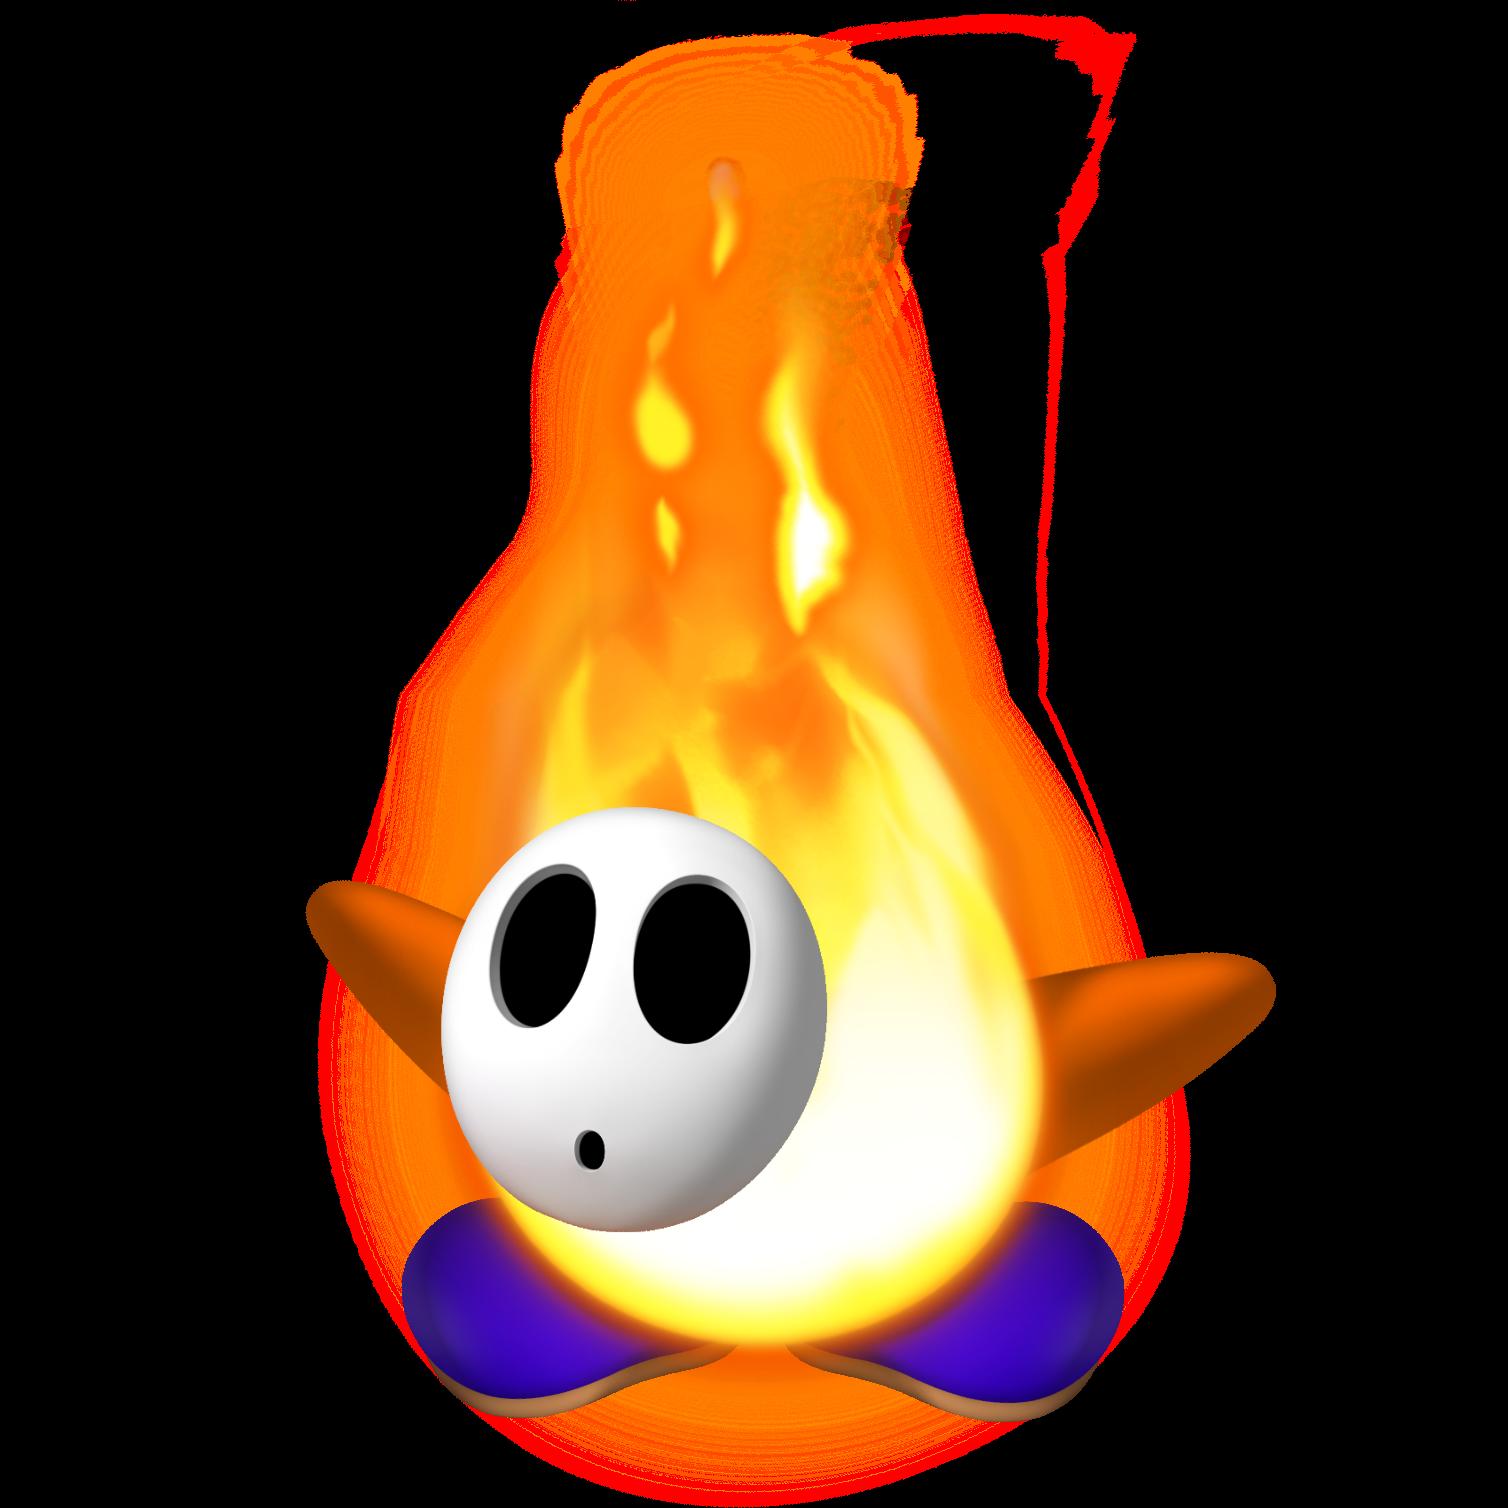 the pyro guy 2